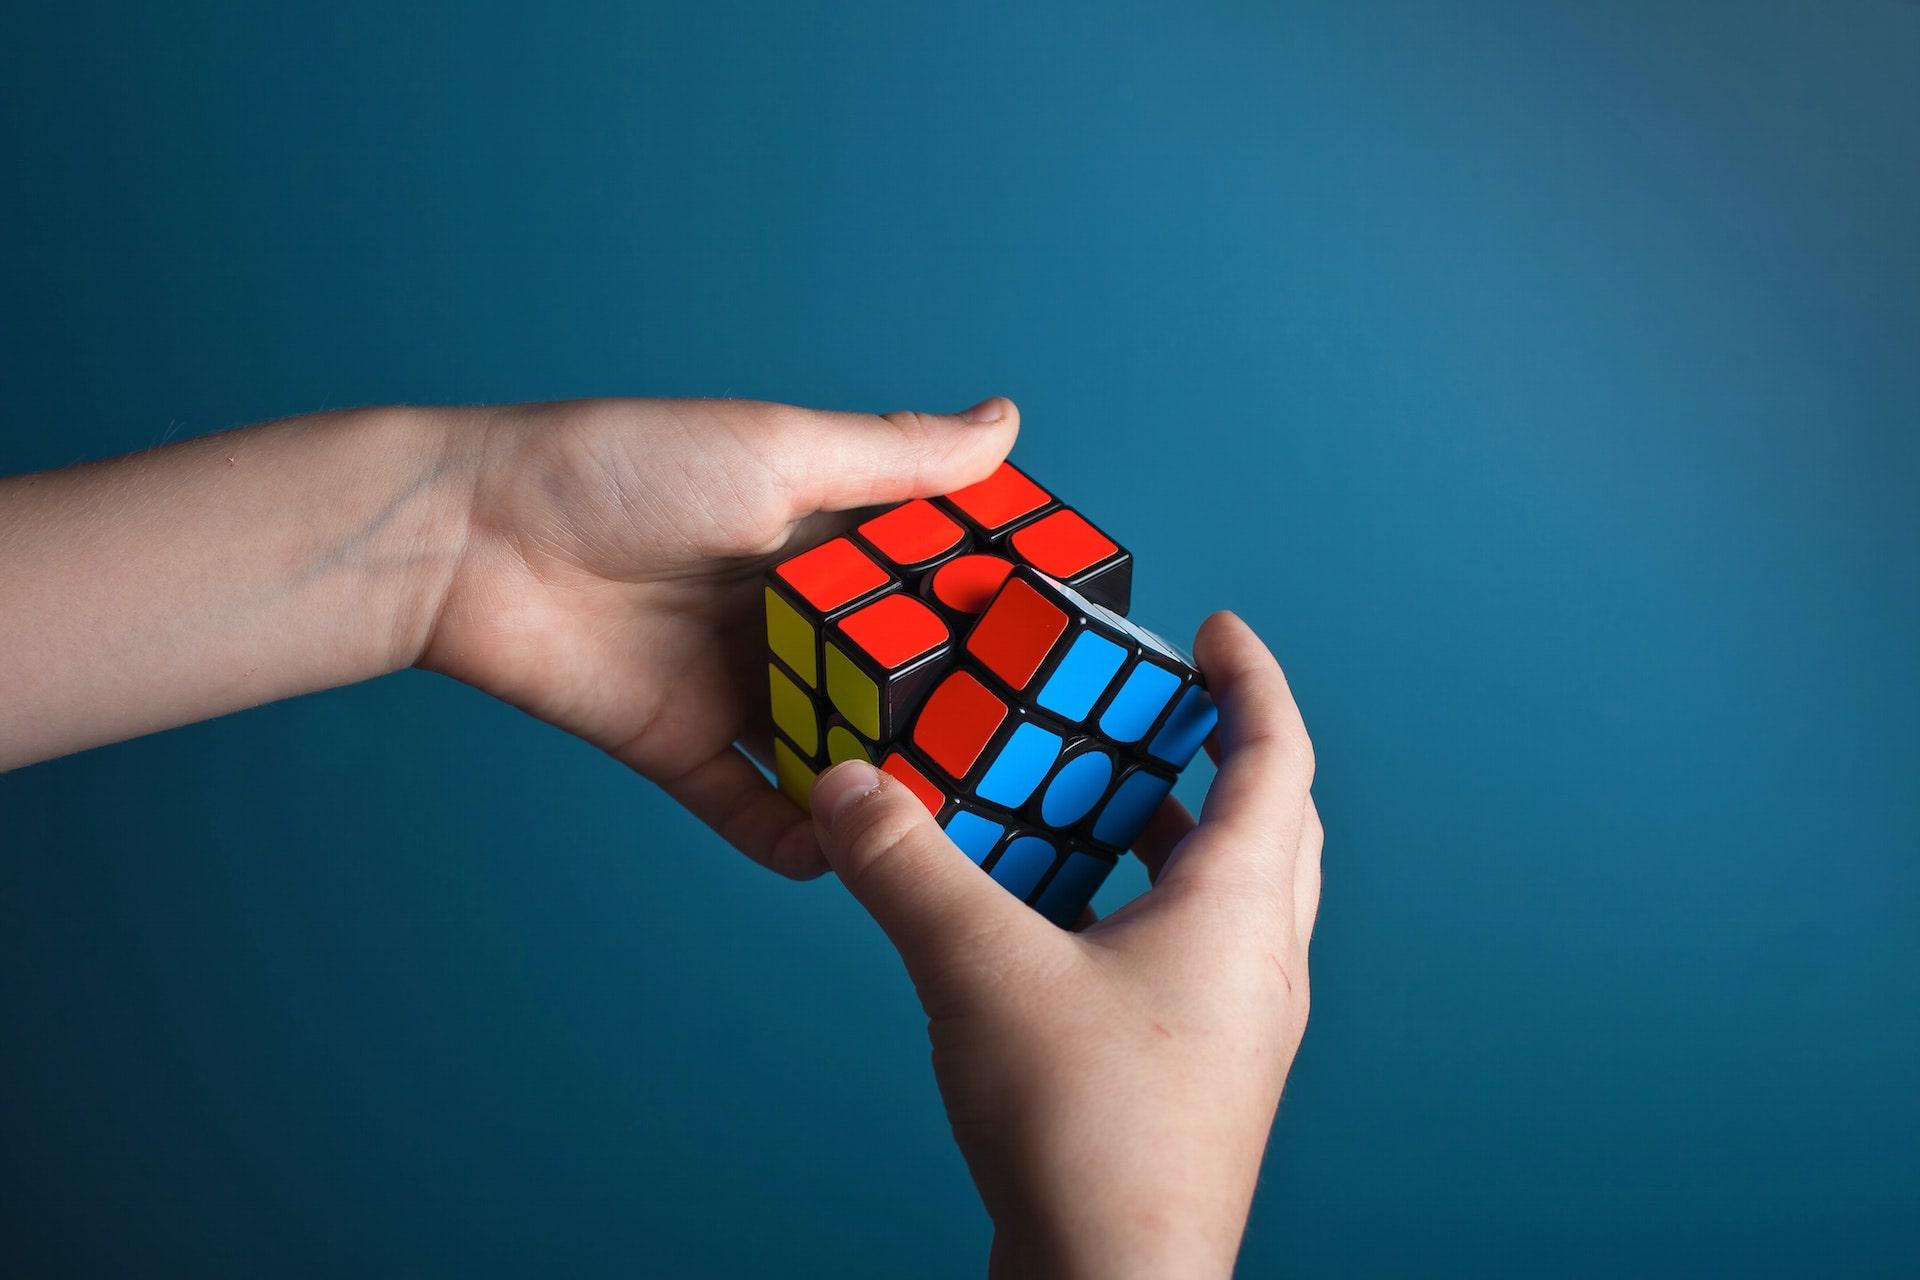 Female Hands Resolving a Rubik's Cube - SolVibrations